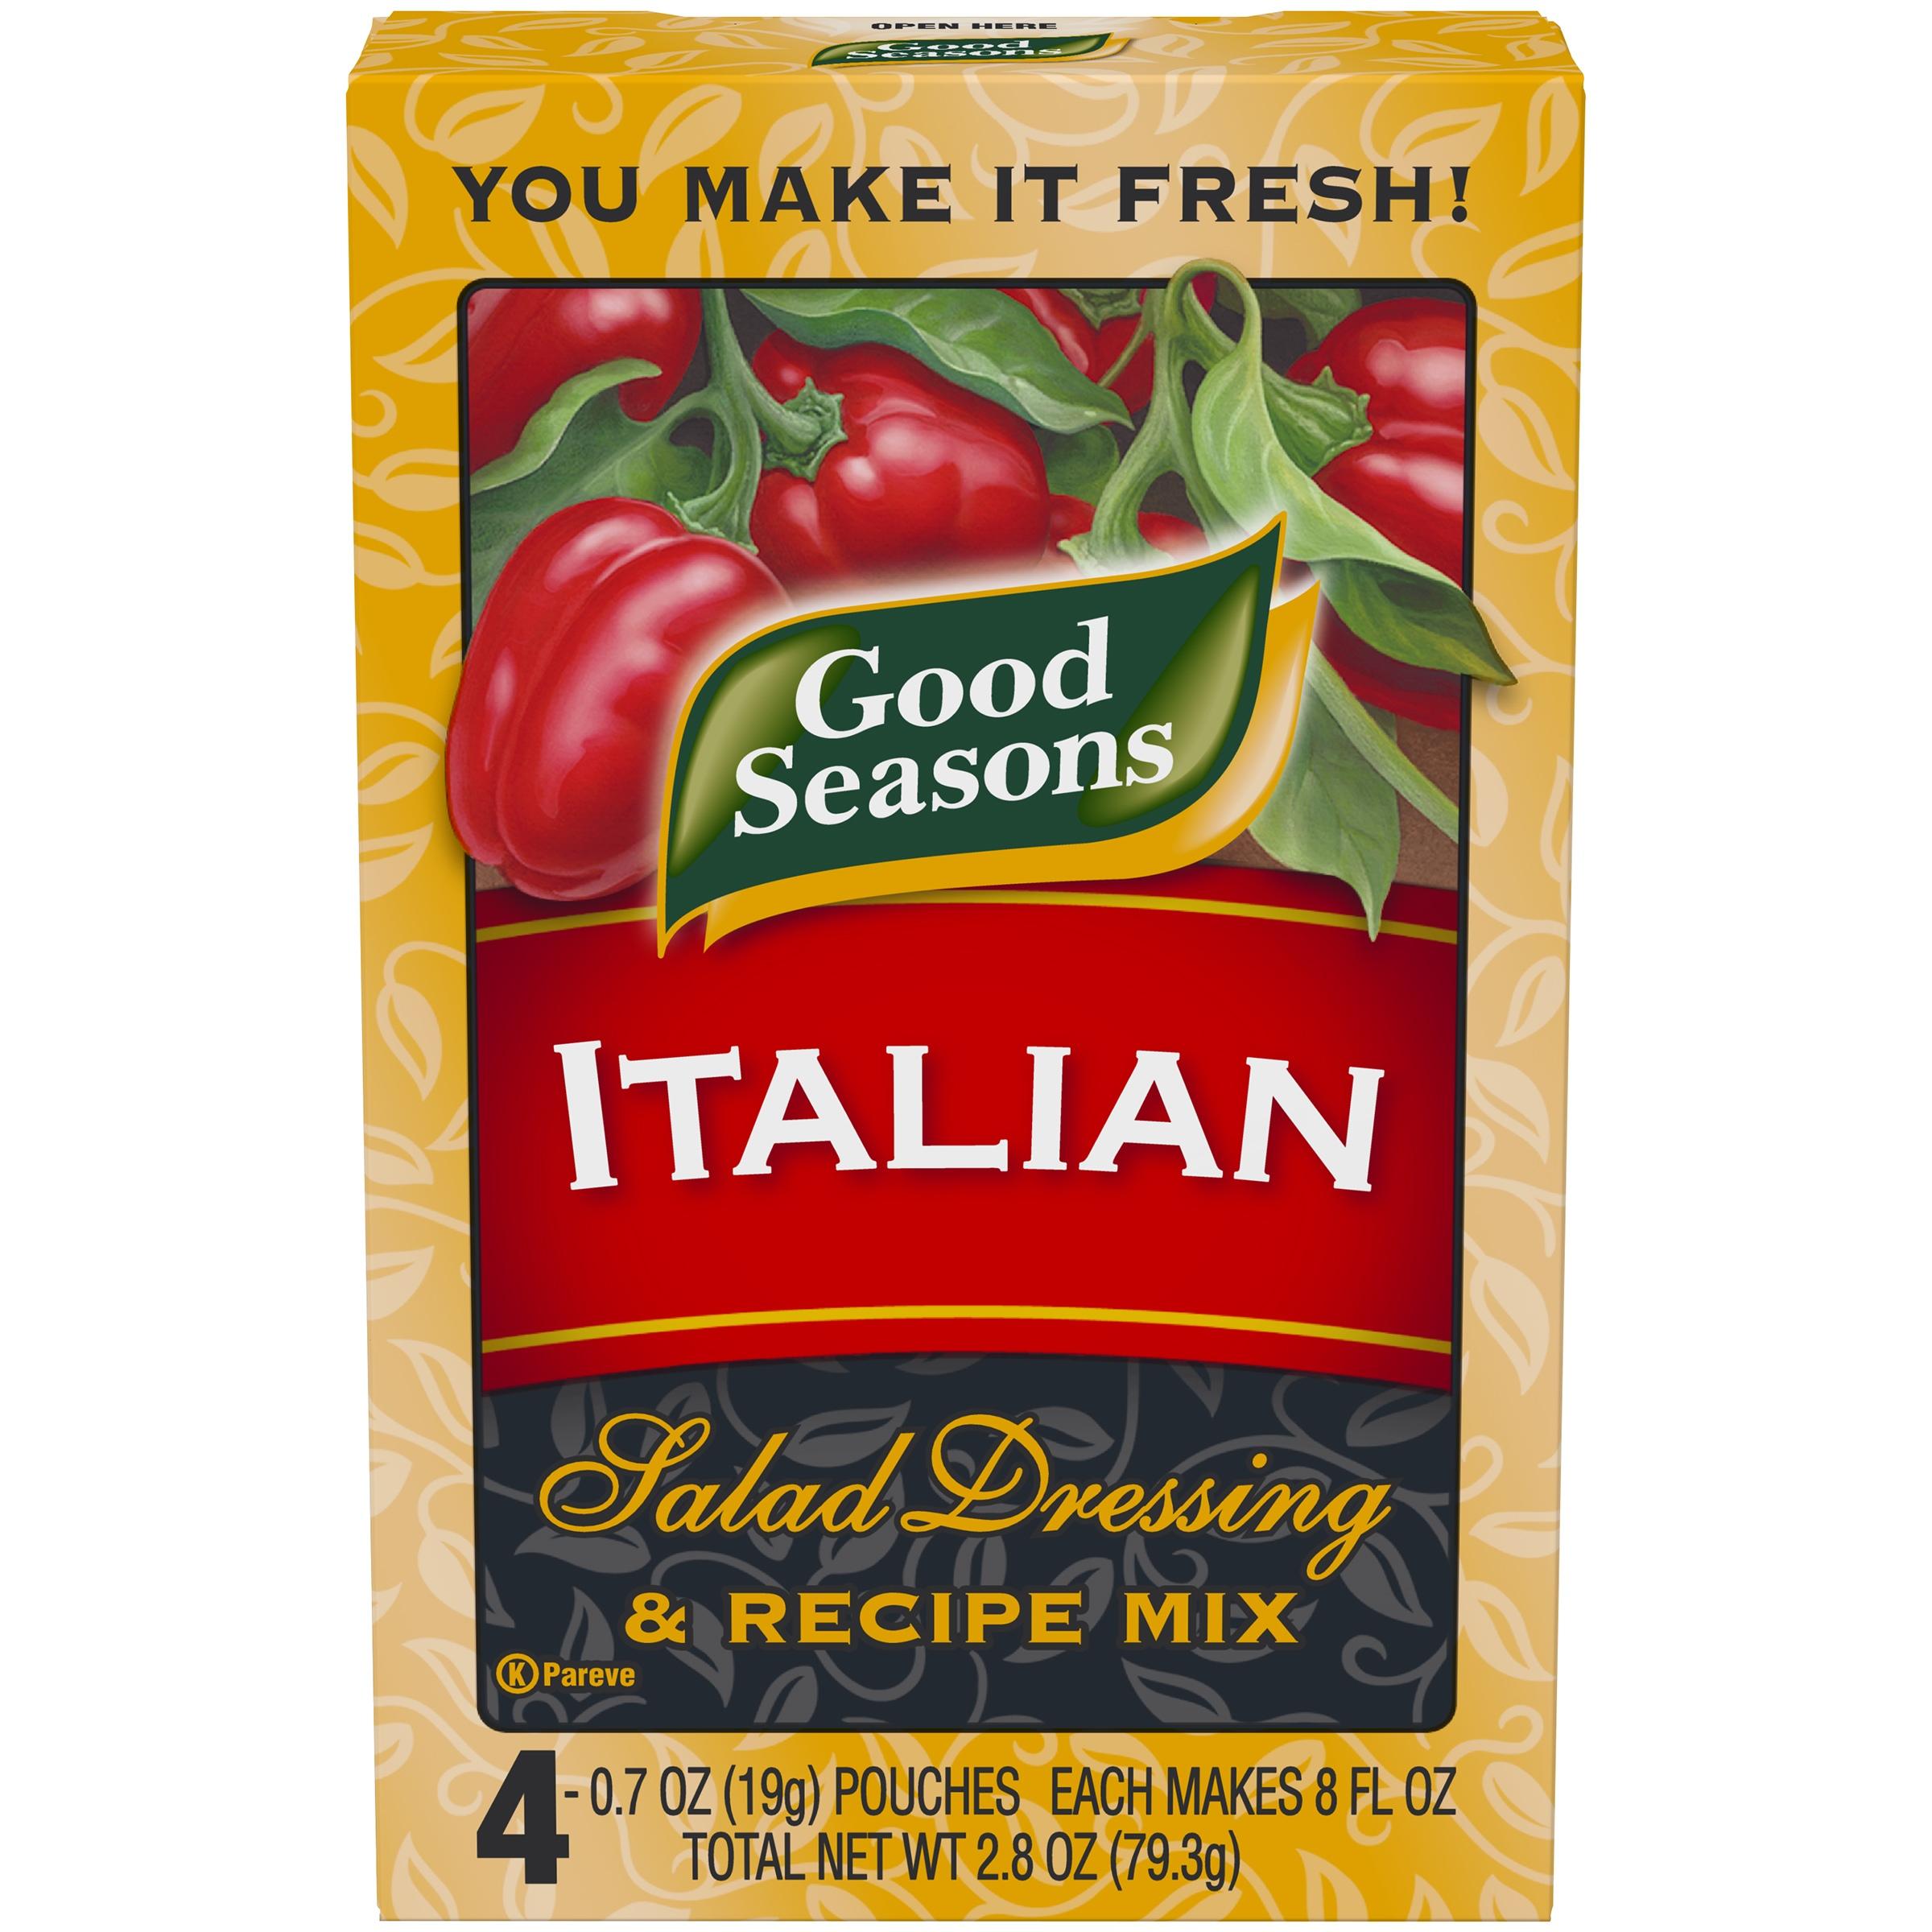 Good Seasons Italian Salad Dressing & Recipe Mix 4-0.7 oz. Packets ...